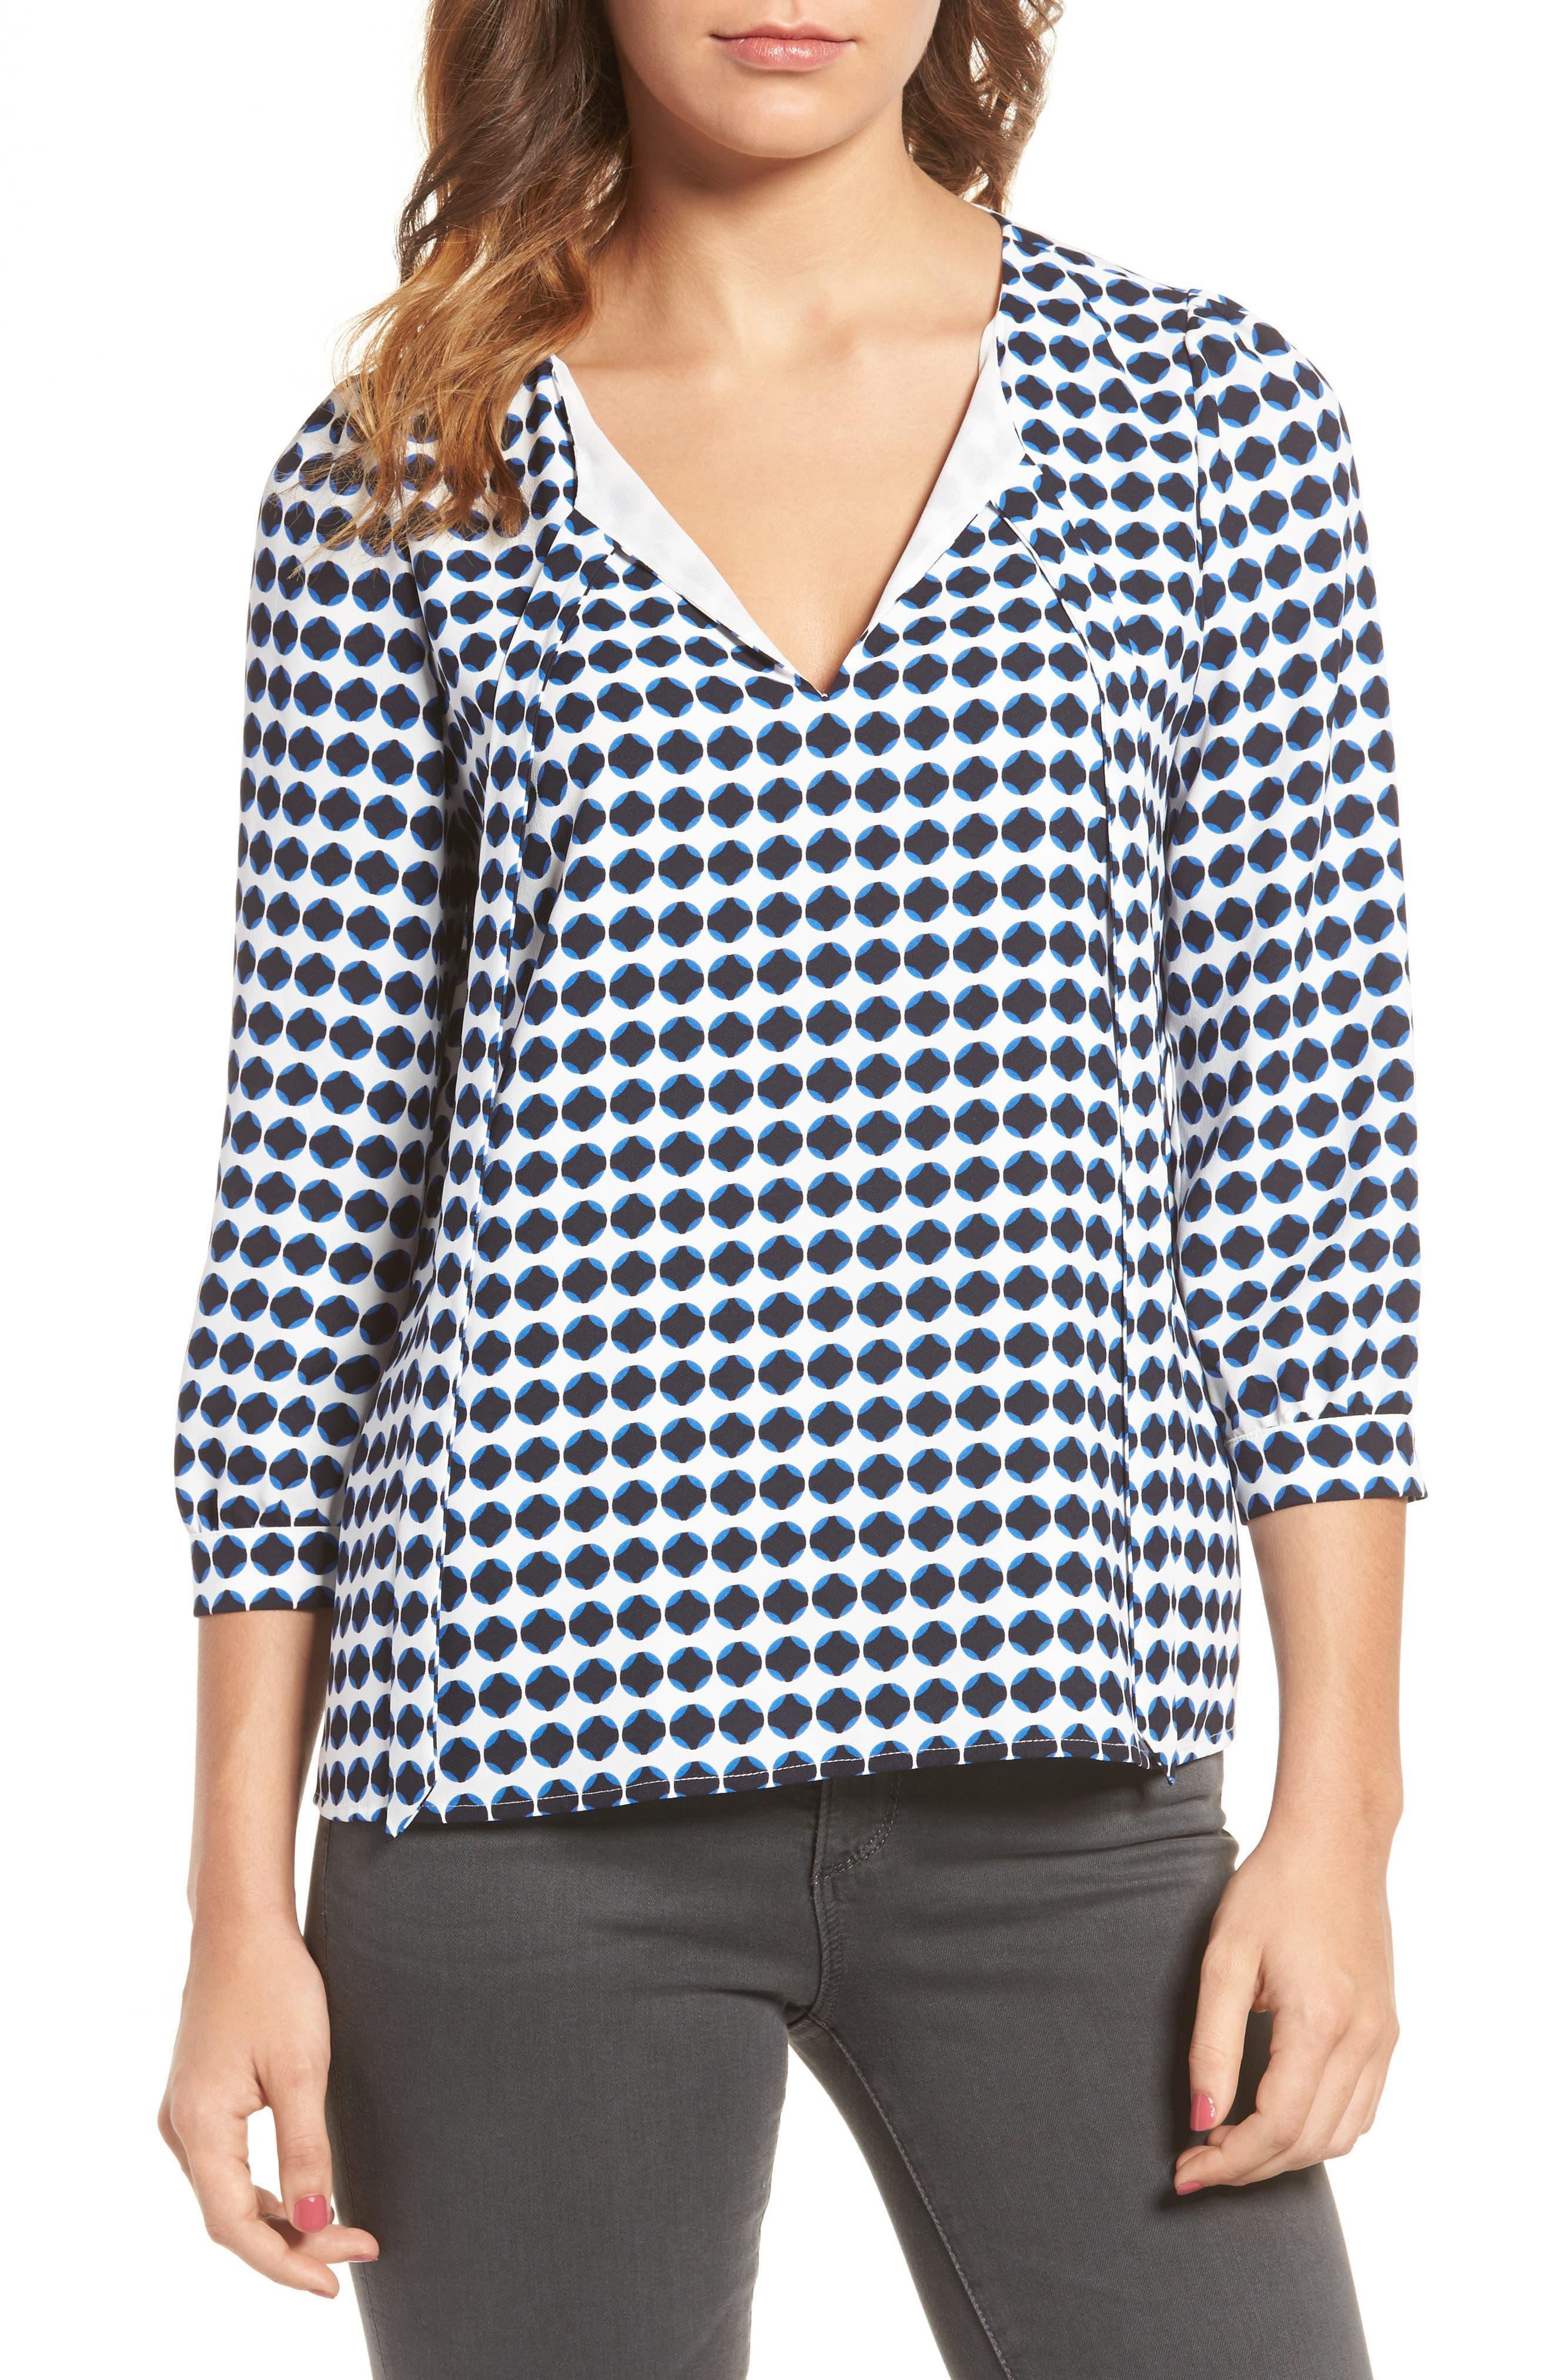 Alternate Image 1 Selected - cooper & ella Valentine Tie Front Blouse